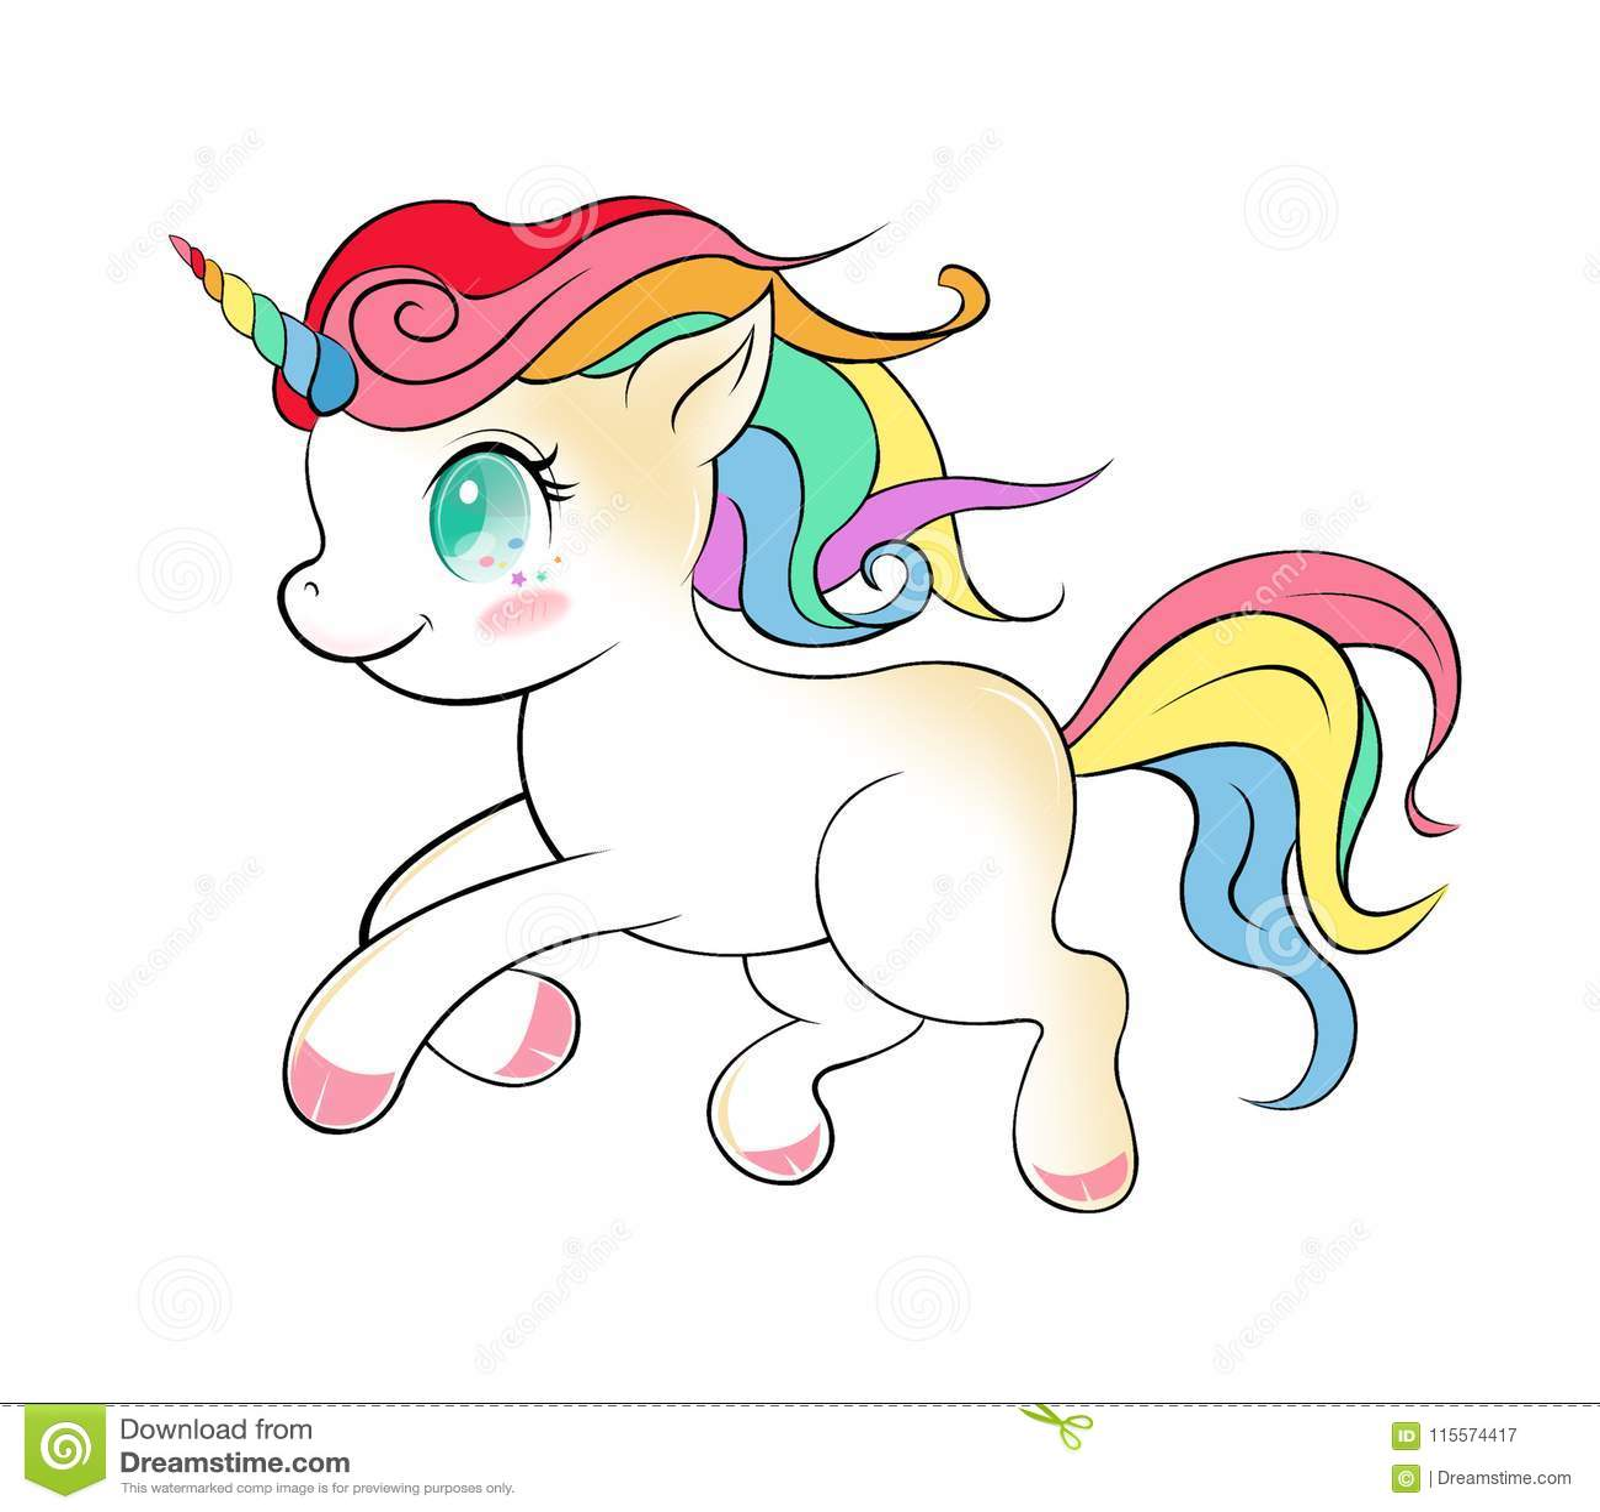 Cute unicorn cartoon vector, Unicorn magic drawing isolated